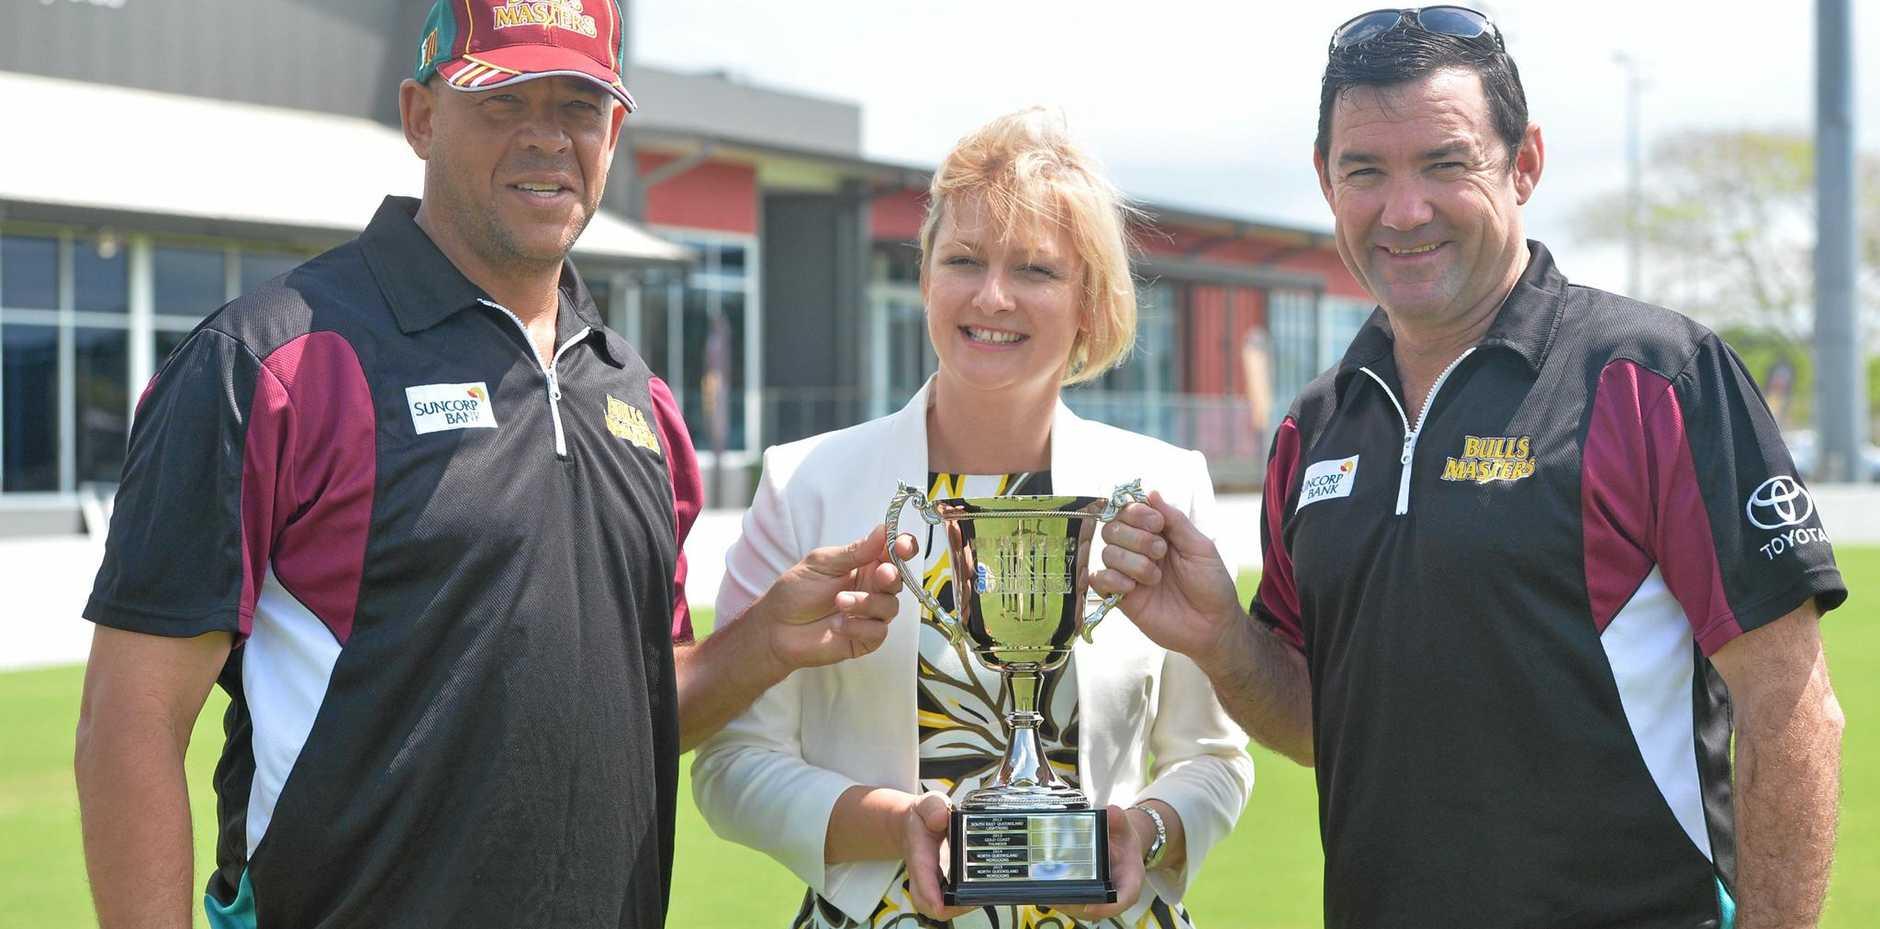 Mackay Regional Council deputy mayor Amanda Camm with Bulls Masters mentors Andrew Symonds and Jimmy Maher.